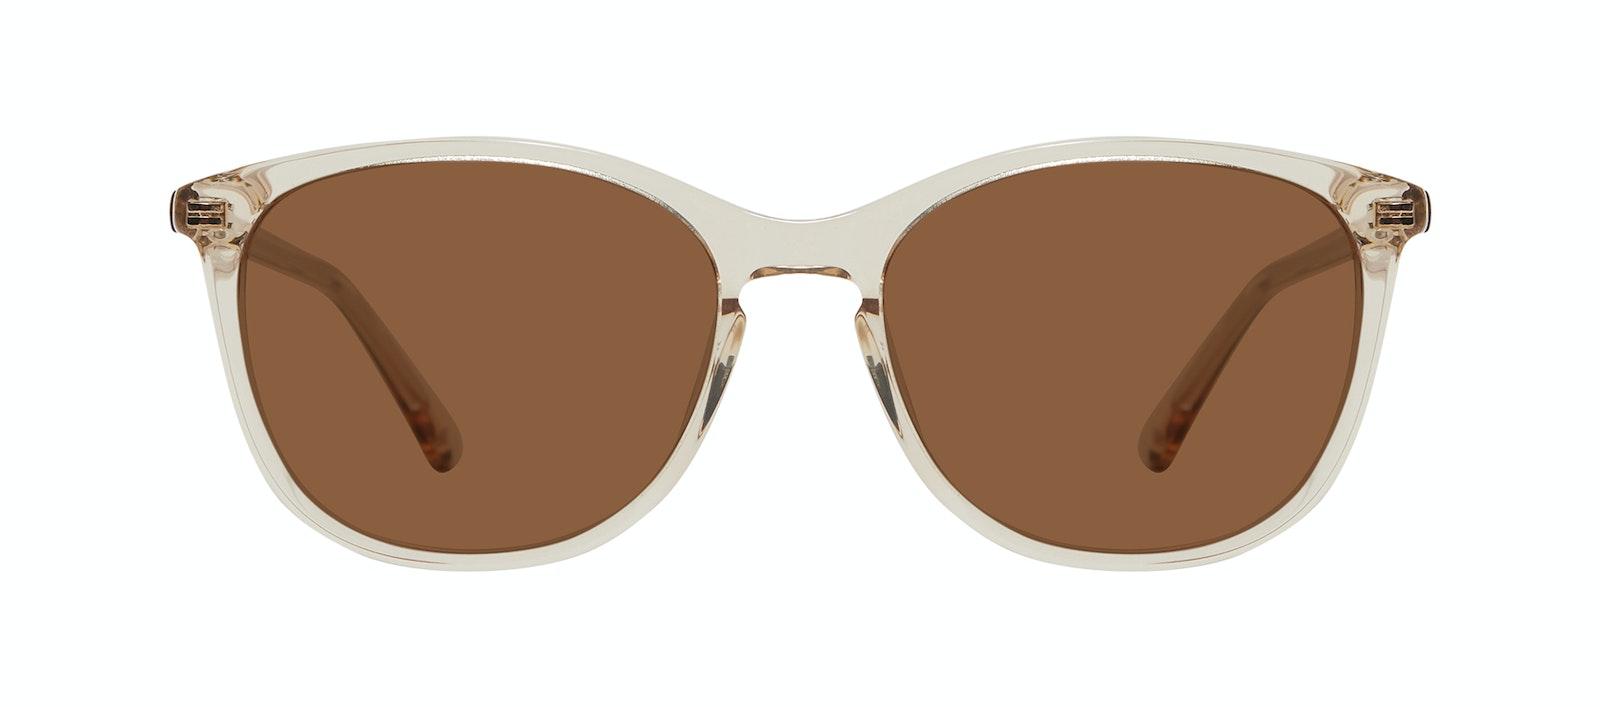 Affordable Fashion Glasses Rectangle Square Round Sunglasses Women Nadine XL Prosecco Front